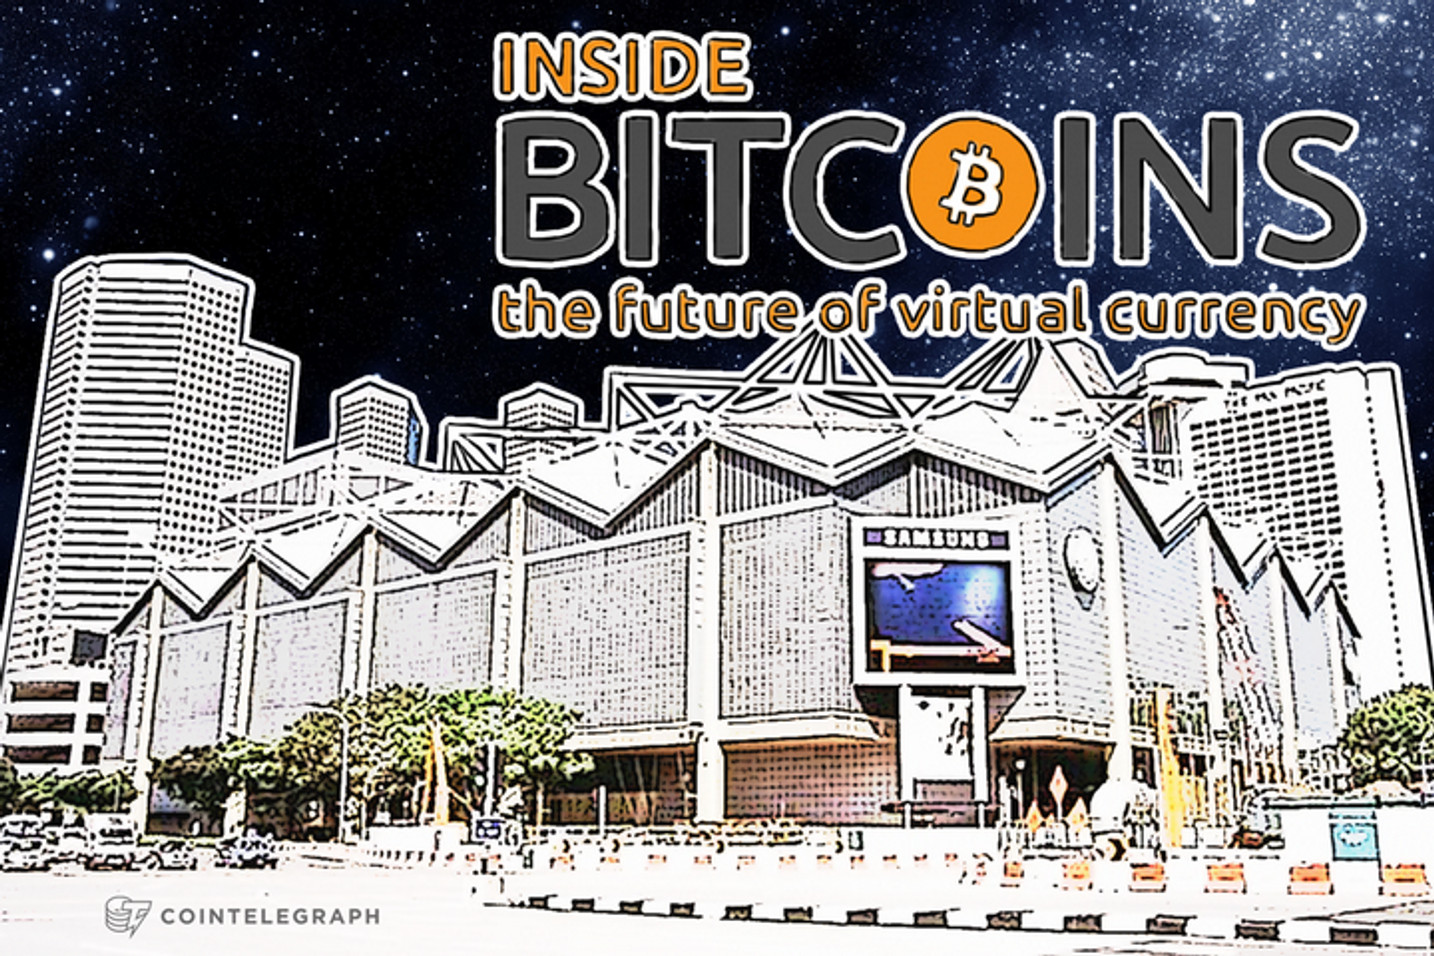 Singapore Hosting Inside Bitcoins 2015 Conference